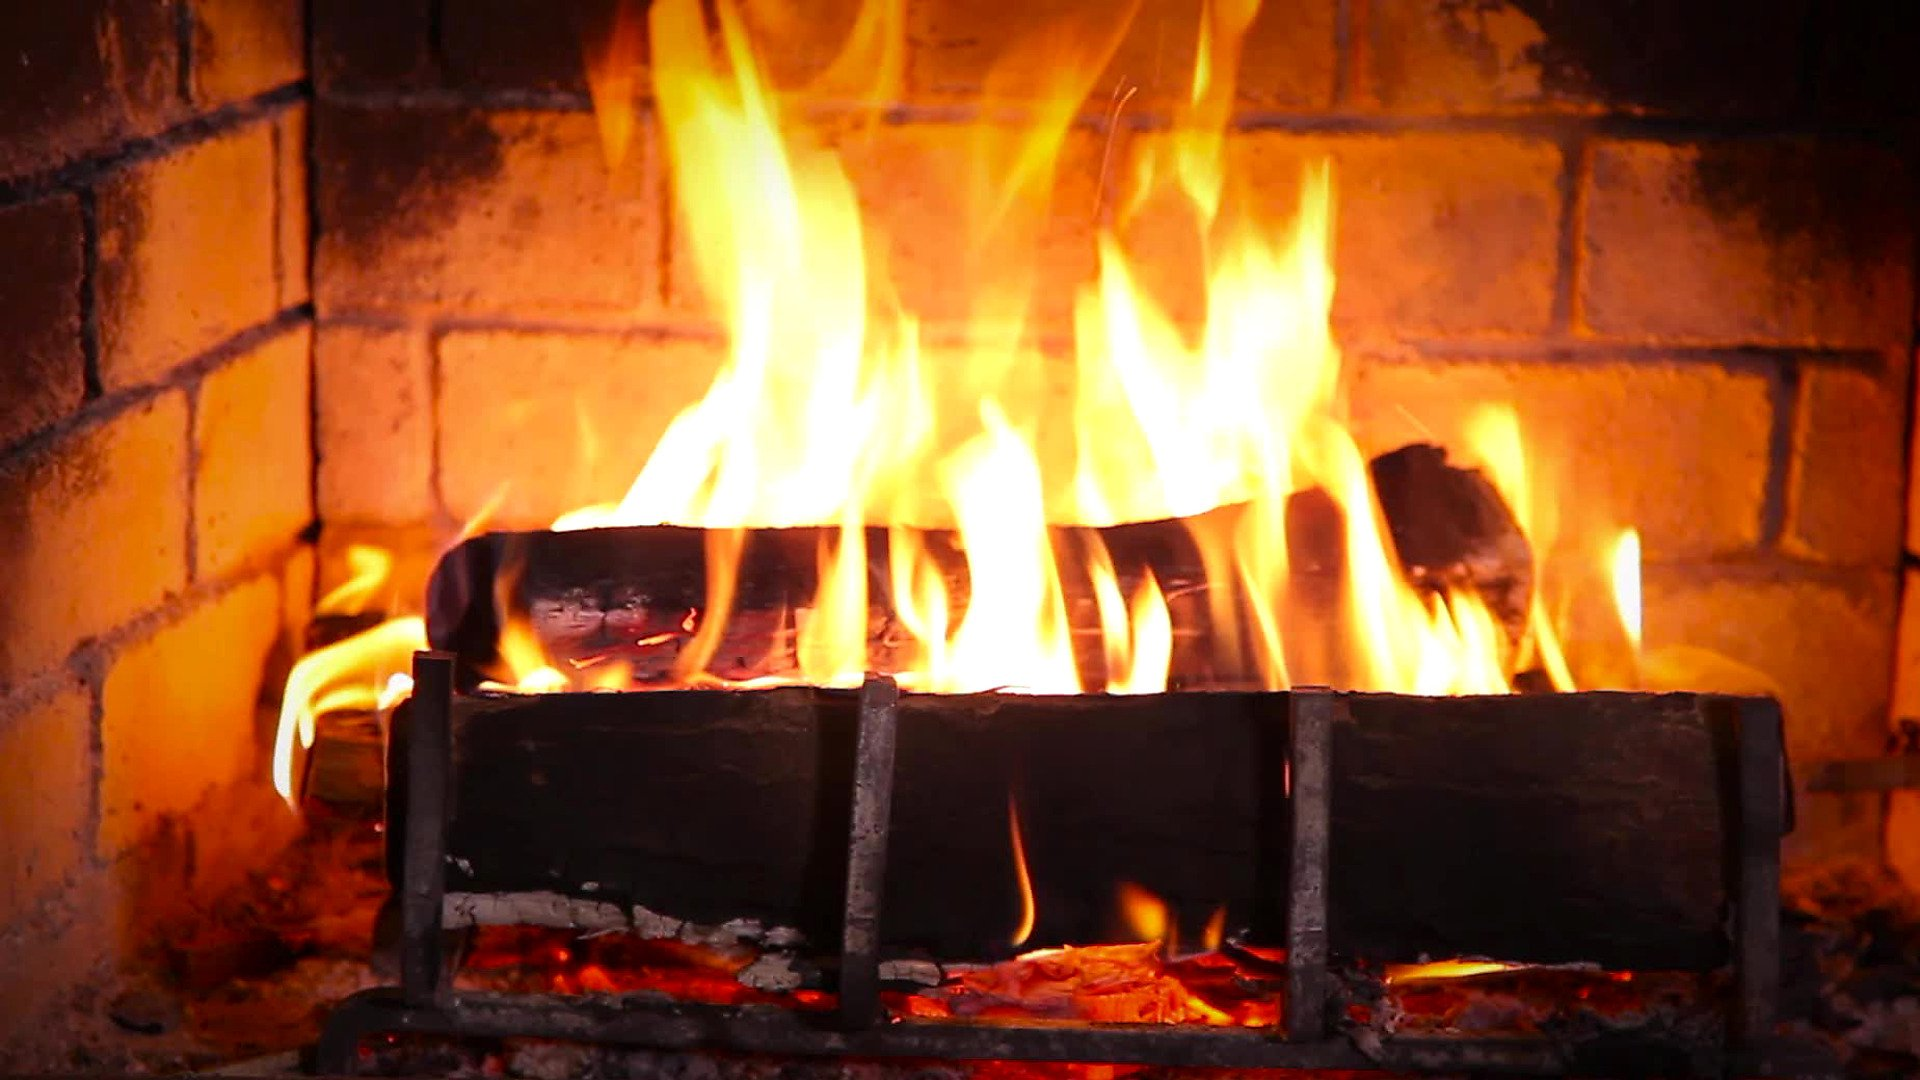 Yule Log Burning in a Fireplace